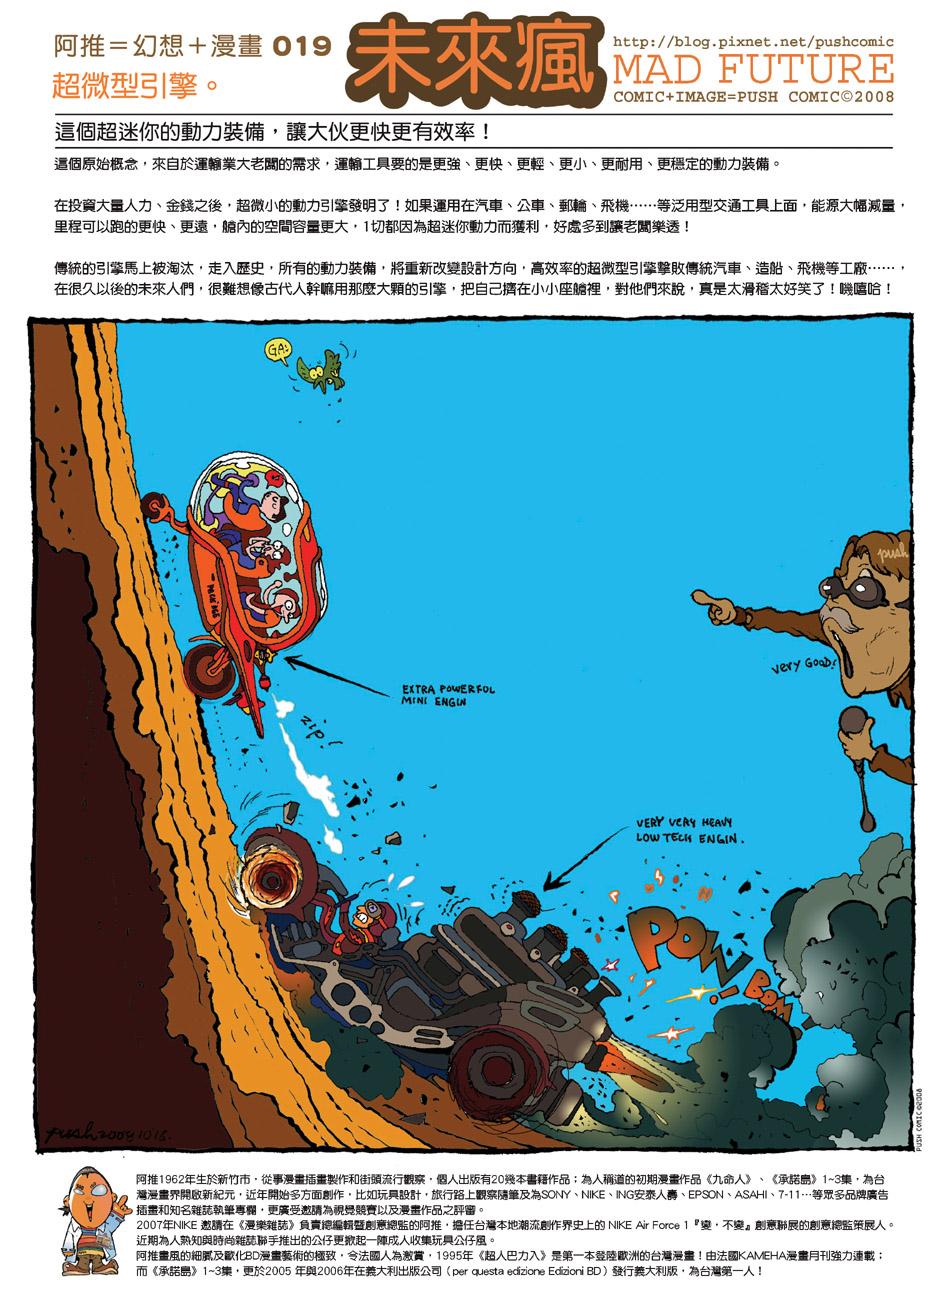 Ming-019-MF-byPUSH-S.jpg